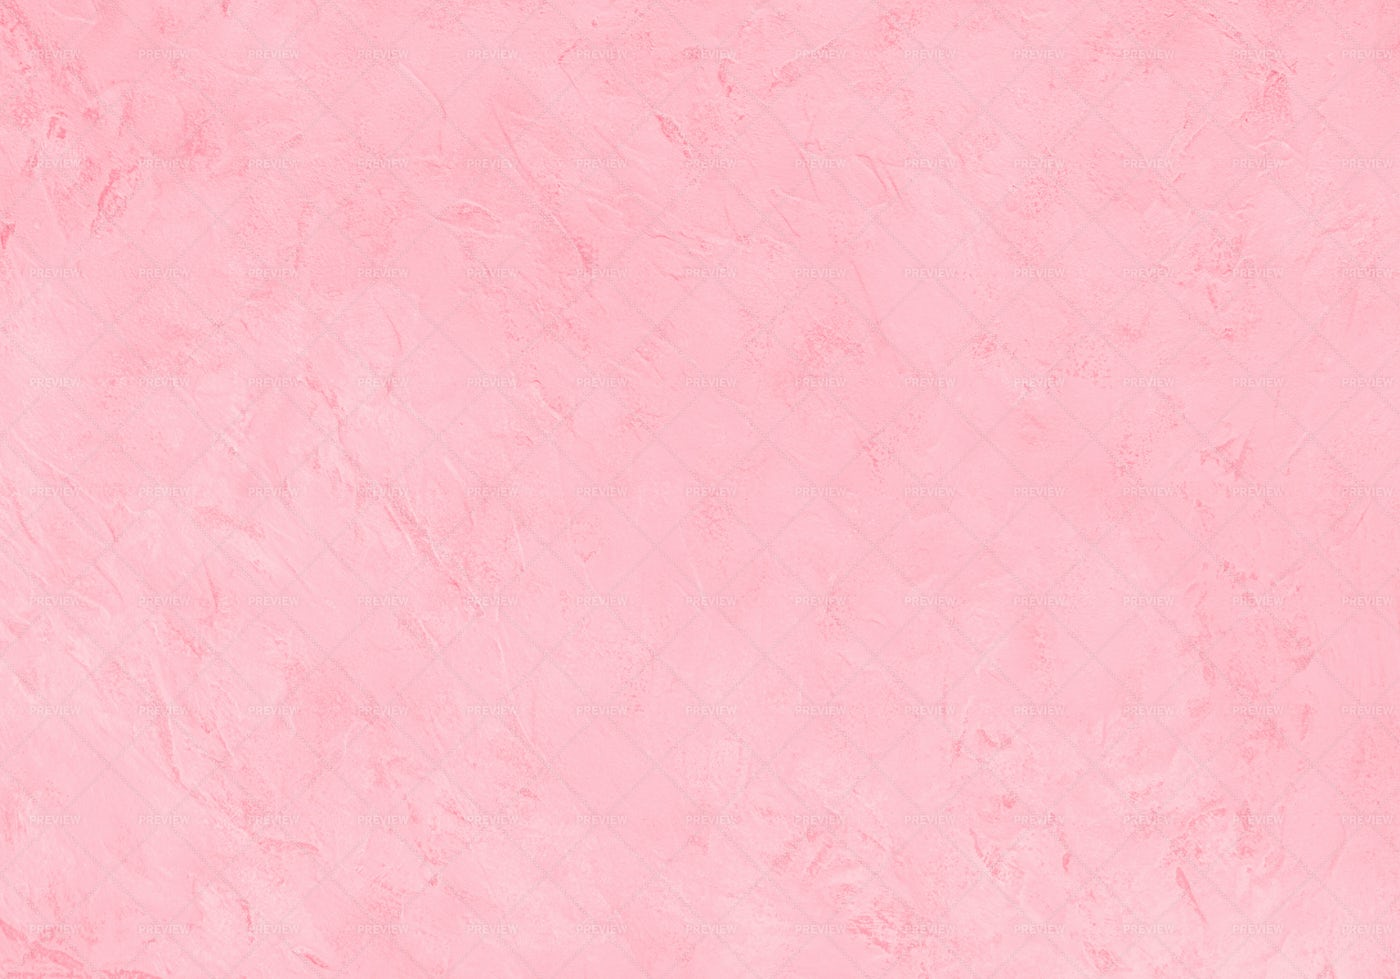 Pastel Pink Textured Background: Stock Photos